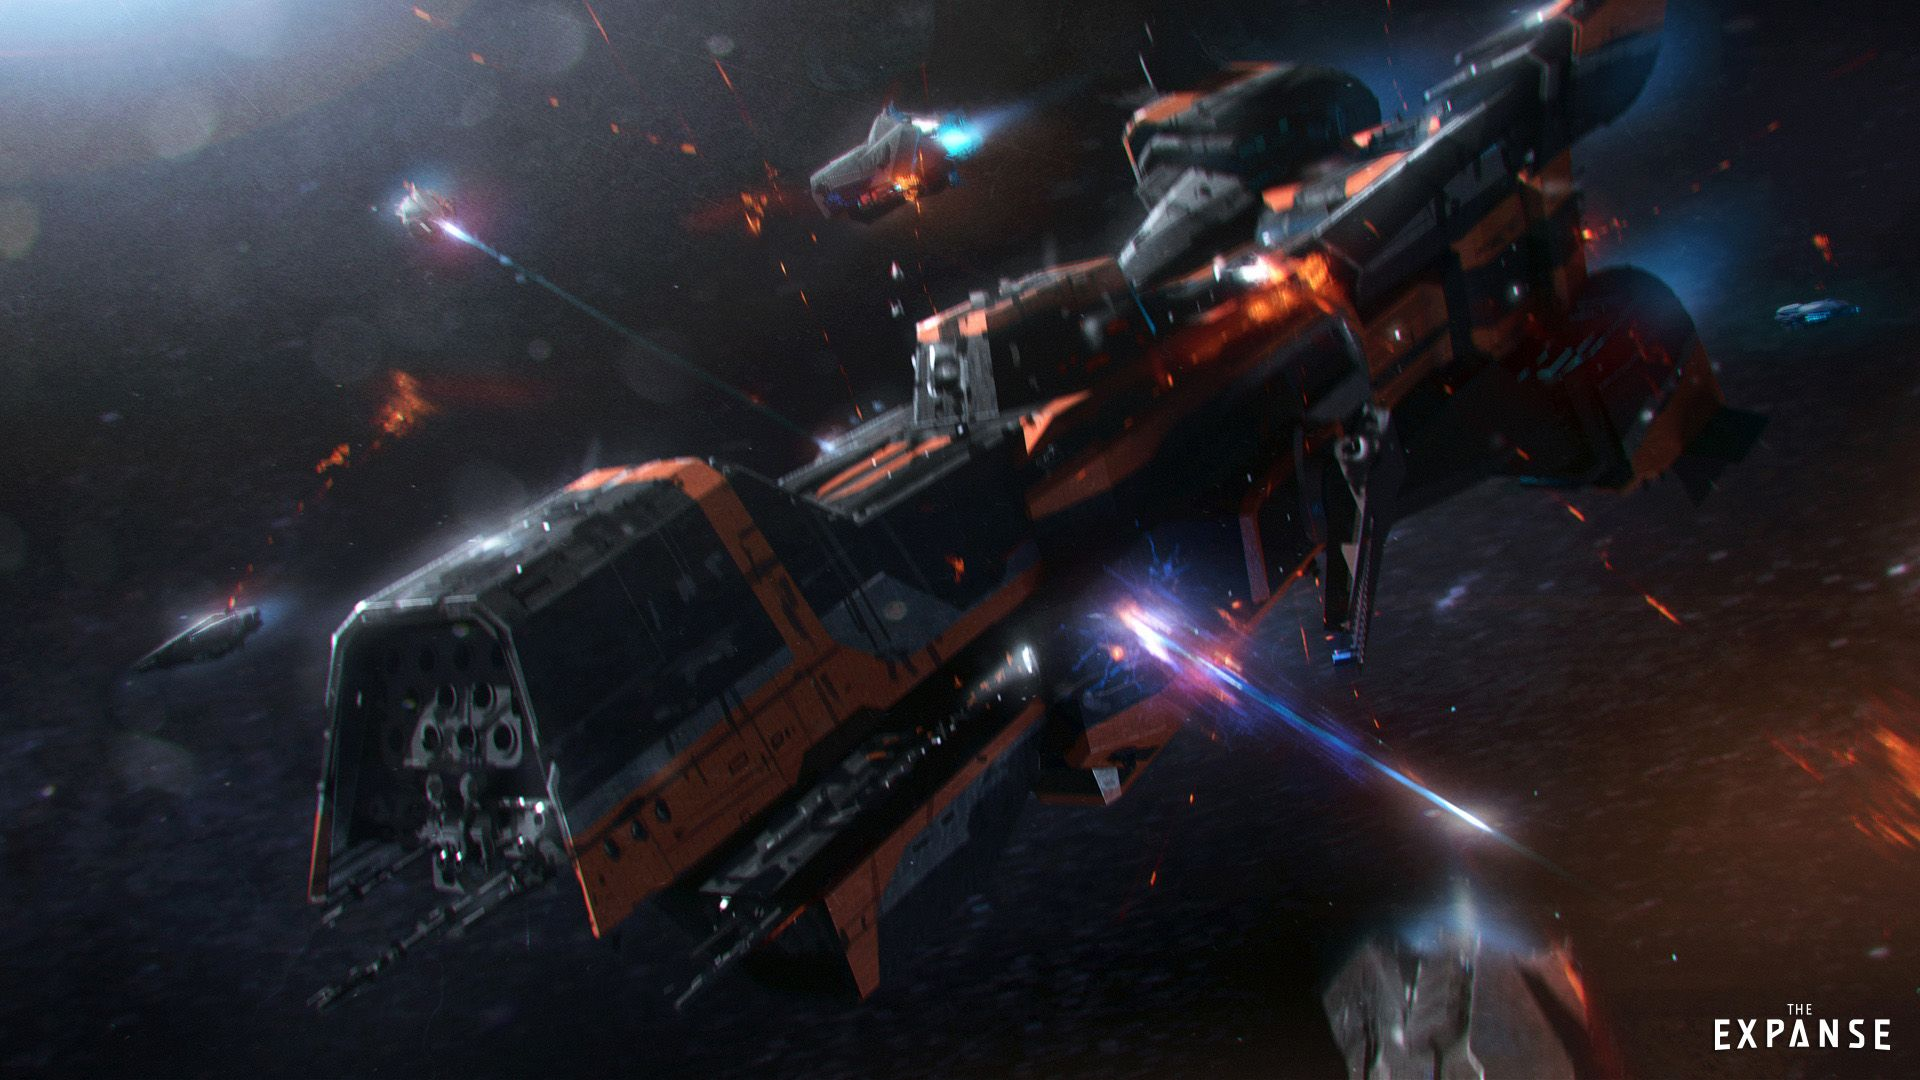 Slikovni rezultat za the expanse battleship